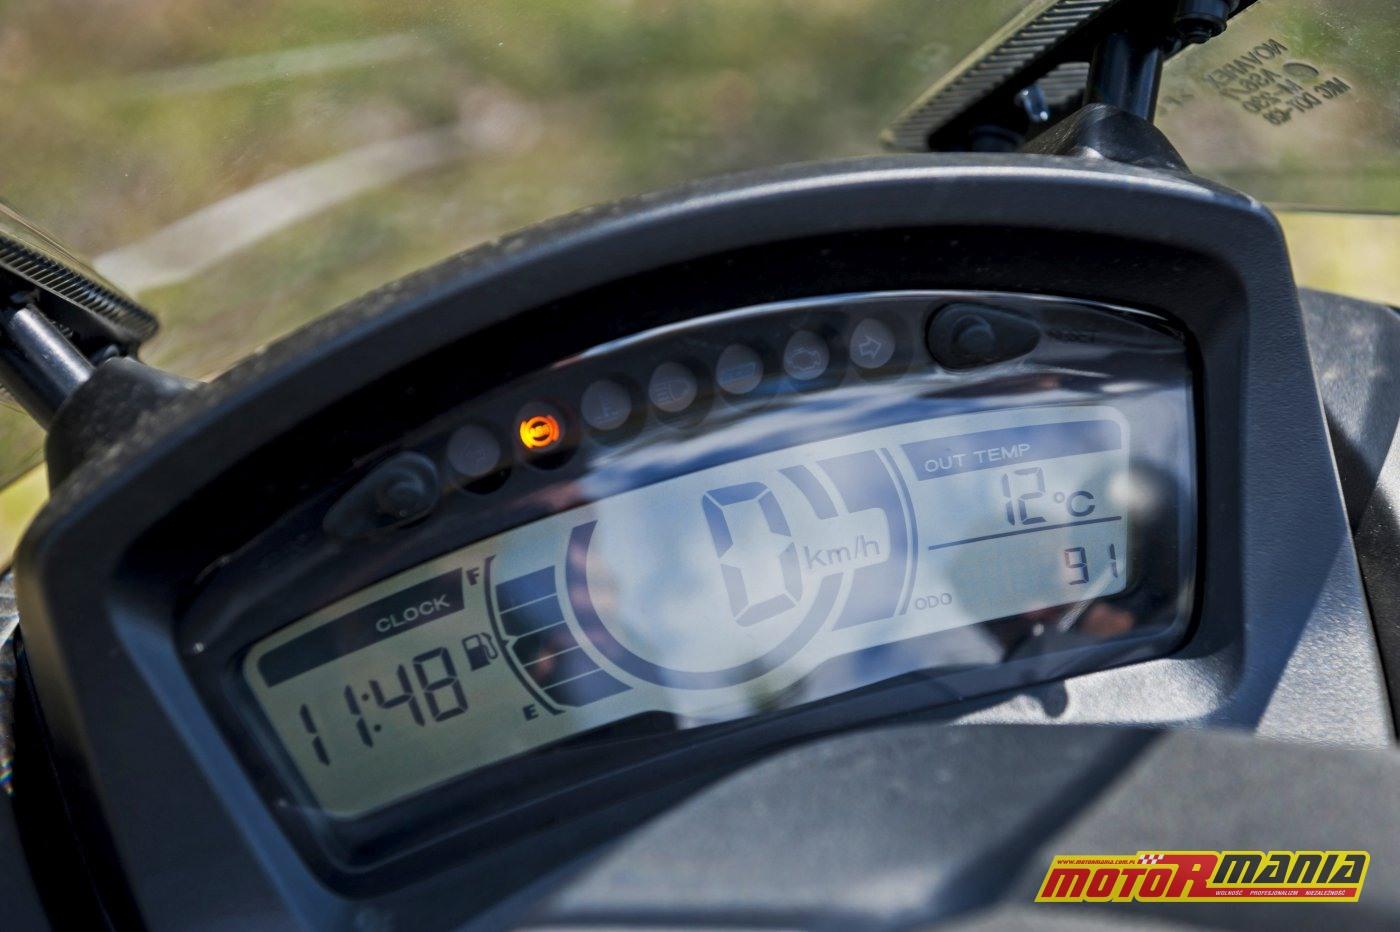 Yamaha Tricity 125 test motormania - fot Tomazi_pl (10)